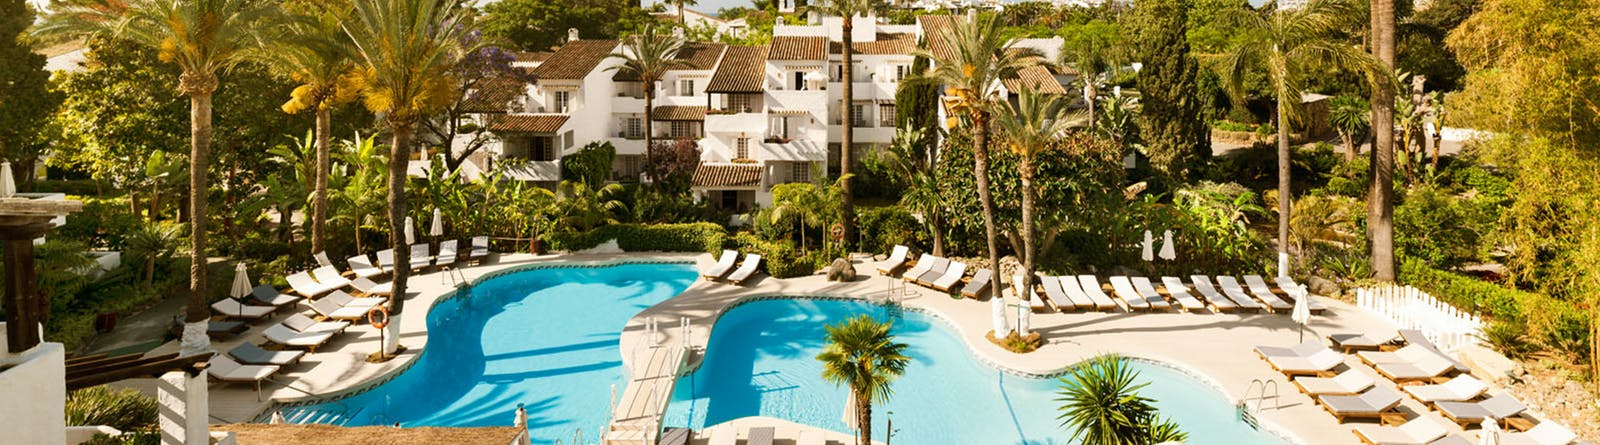 2 12 Puente Romano Beach Resort And Spa Marbella